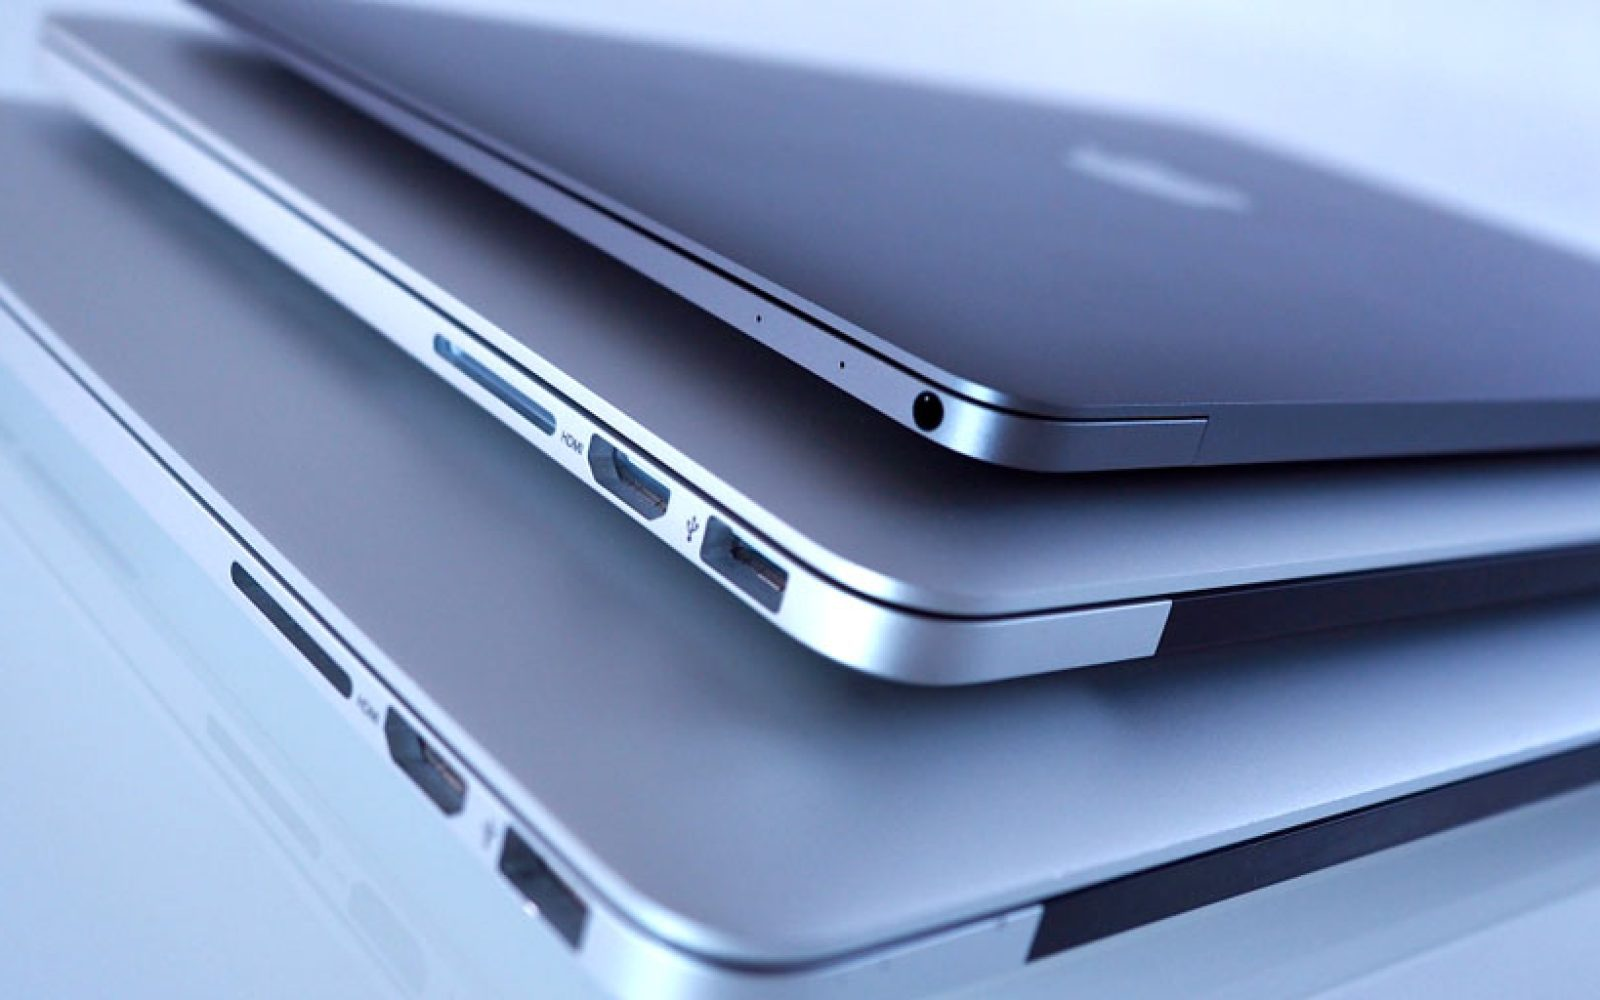 MacBook cover image